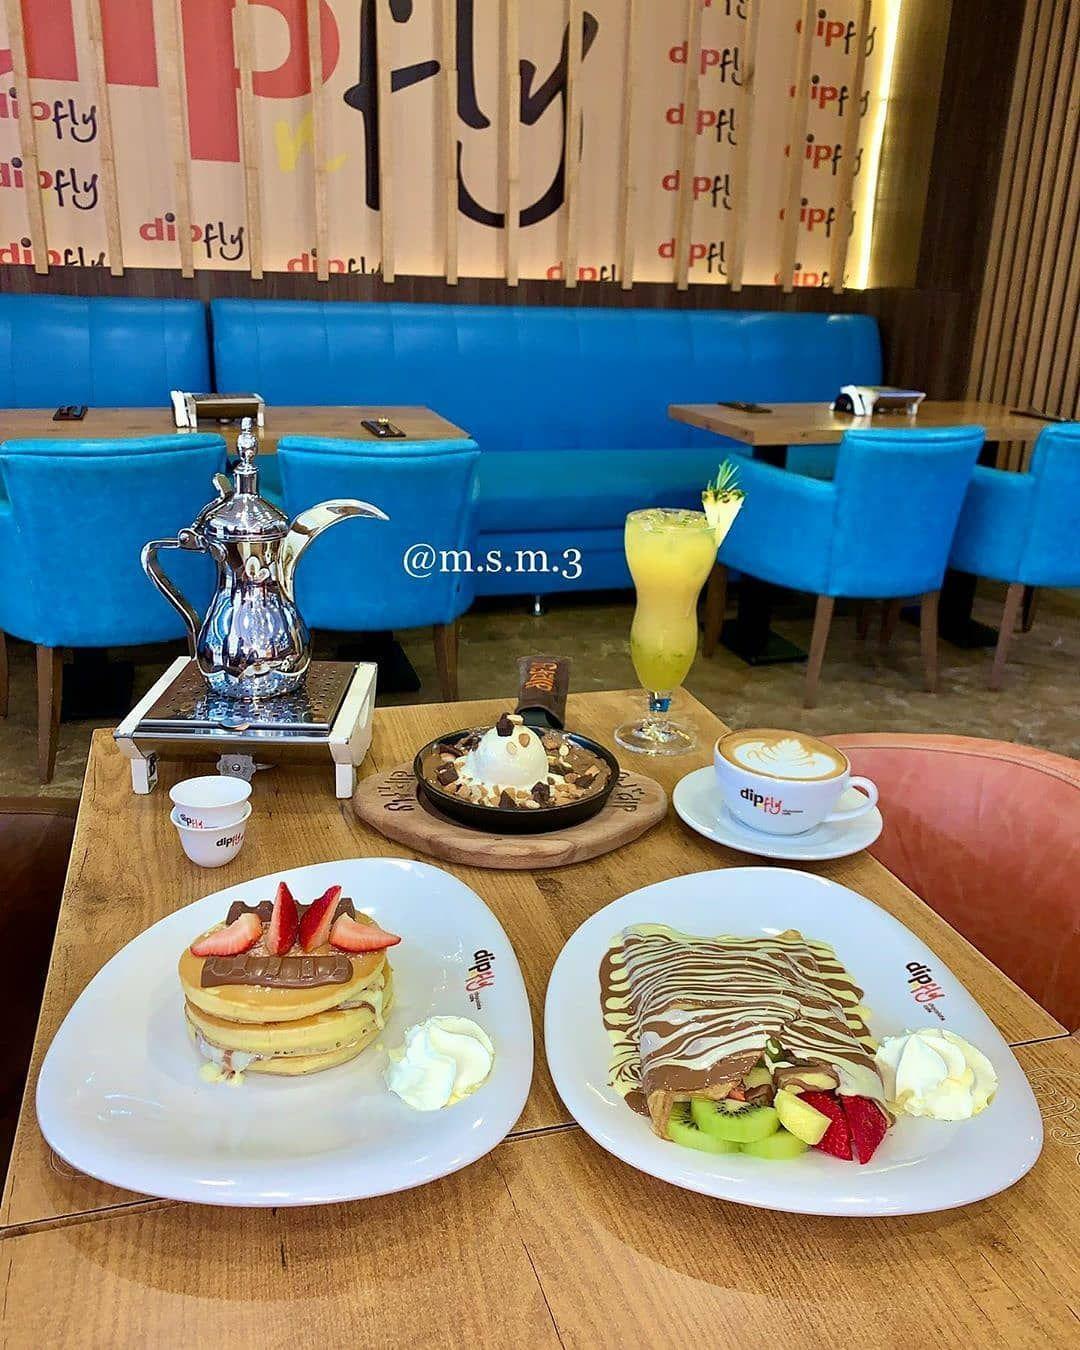 445 Likes 18 Comments كافيهات جدة Jeddah Cafe On Instagram ديب ان فلاي بالسلام مول منطقة المطاعم صور جميلة Table Settings Table Decorations Decor